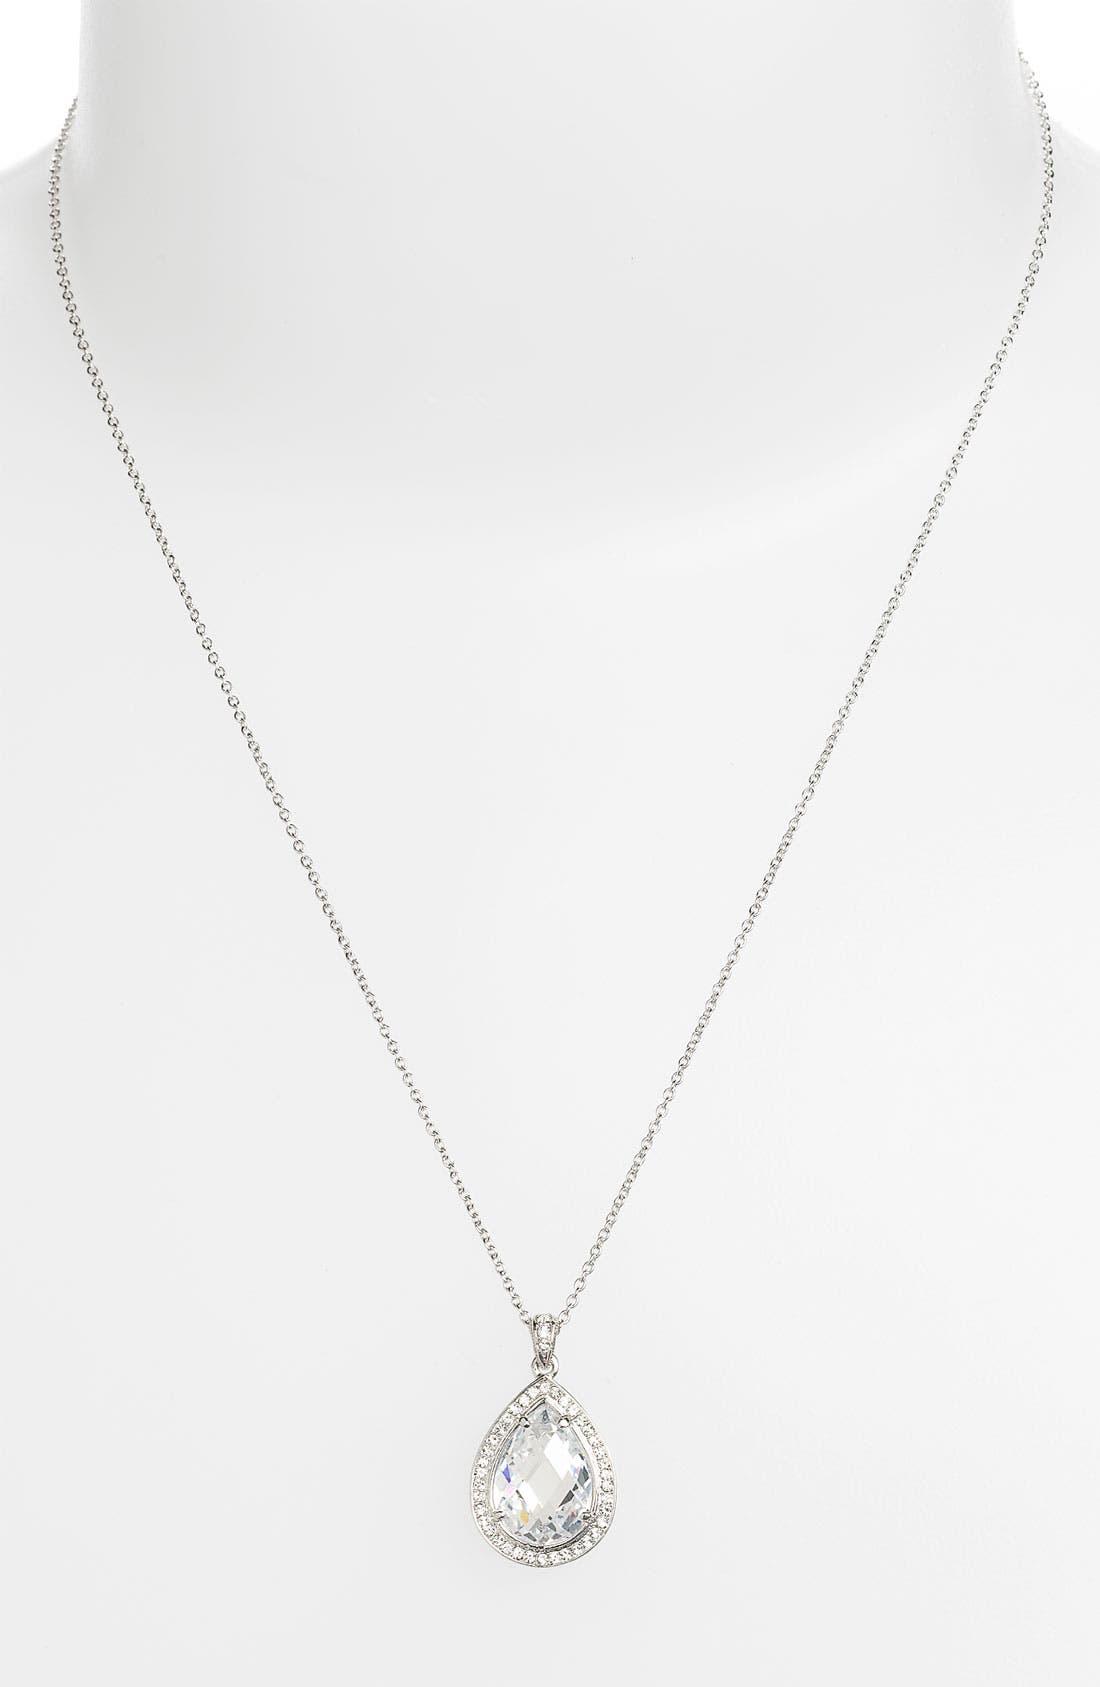 NADRI, Boxed Teardrop Pendant Necklace, Main thumbnail 1, color, 040